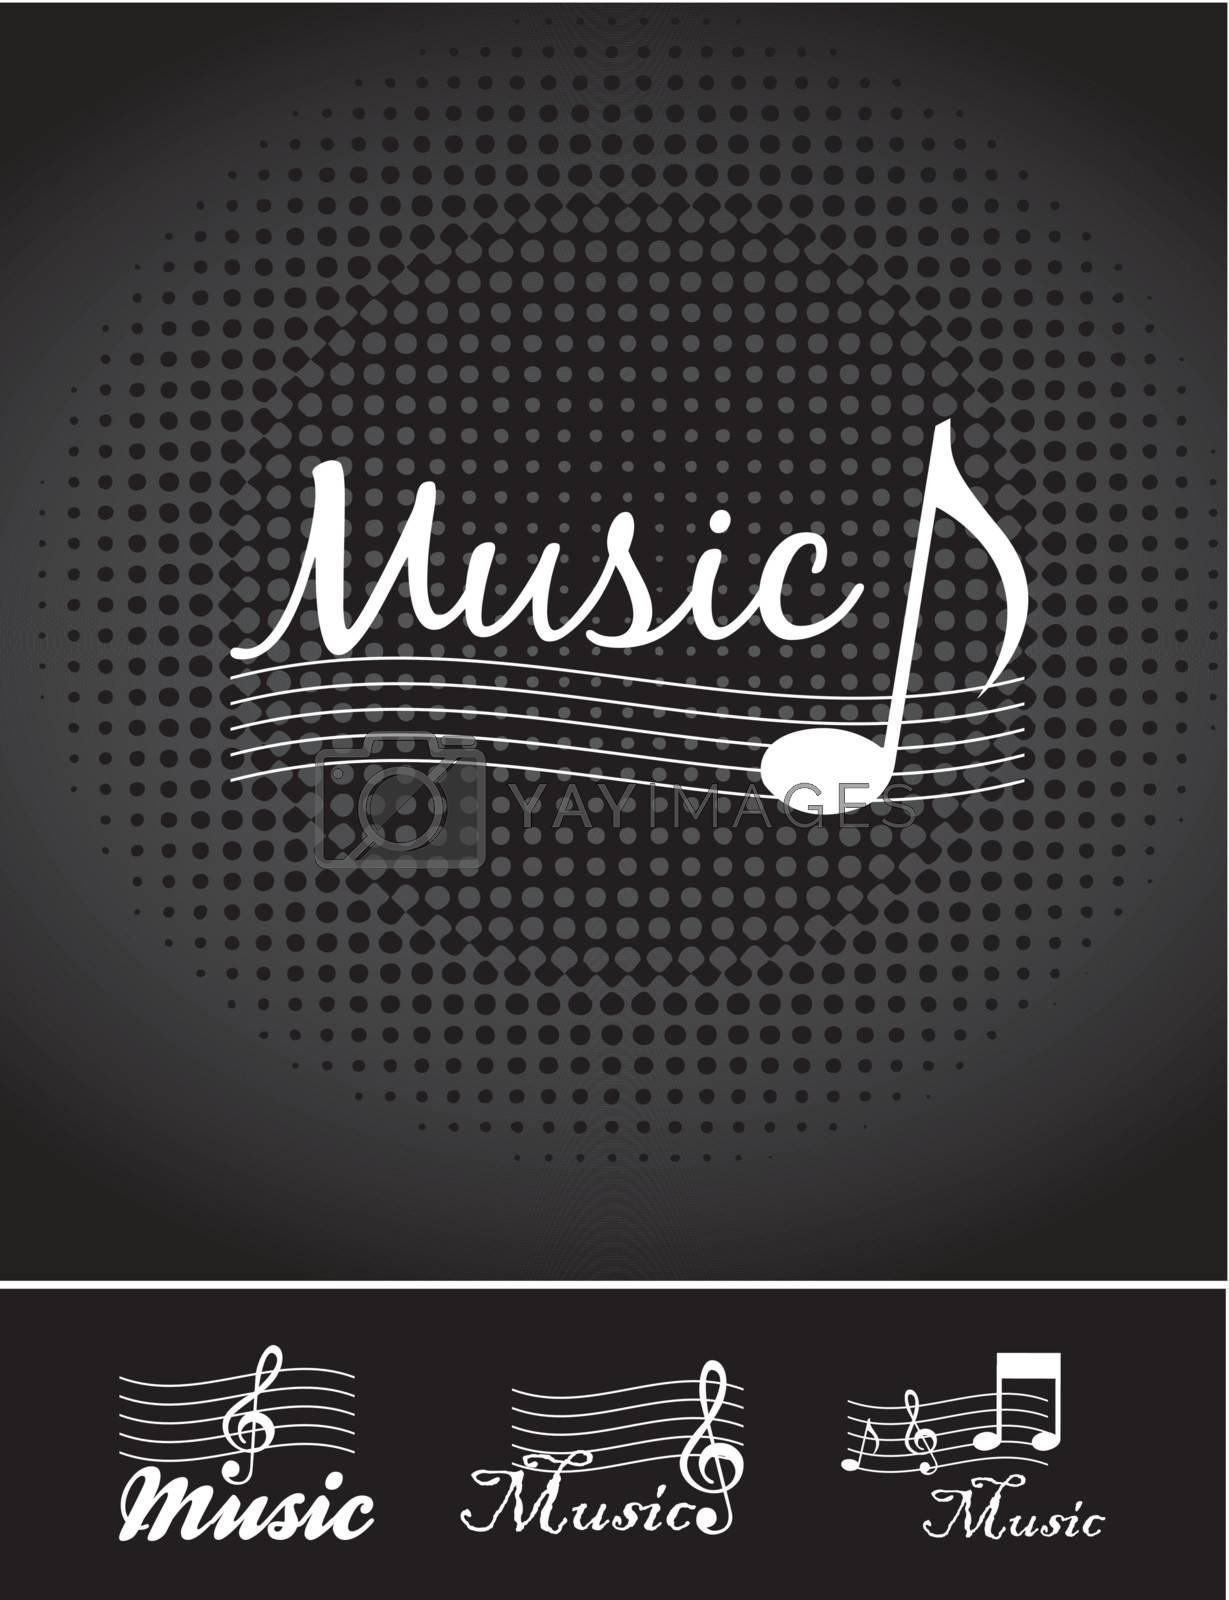 Music notes over black background vector illustration